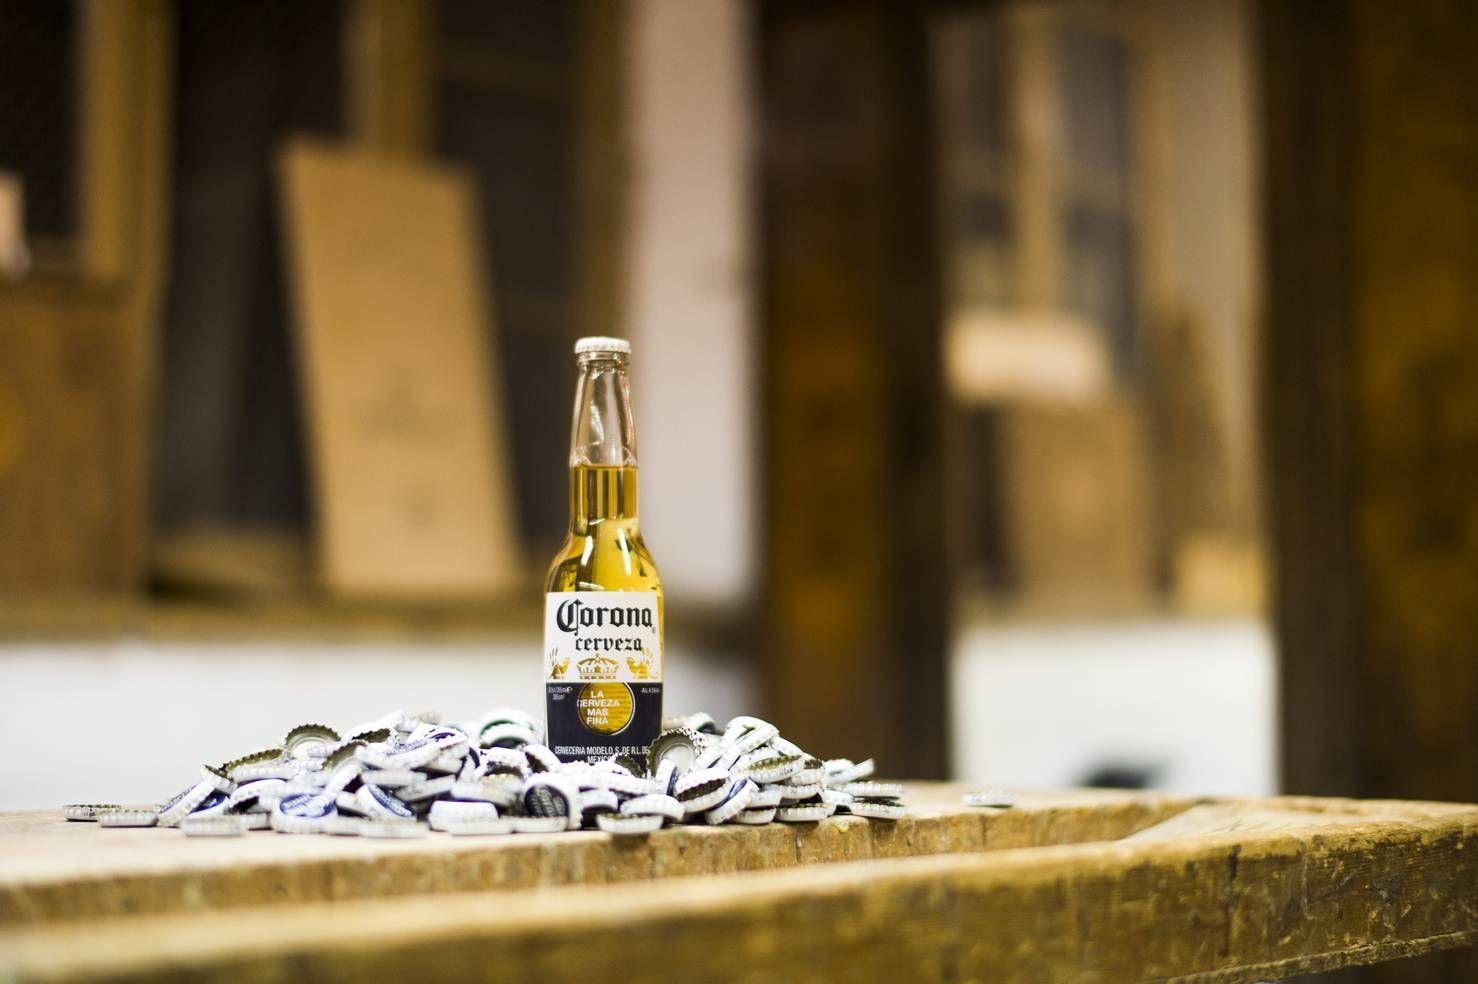 Cerveza Corona/Long Days/Longboard